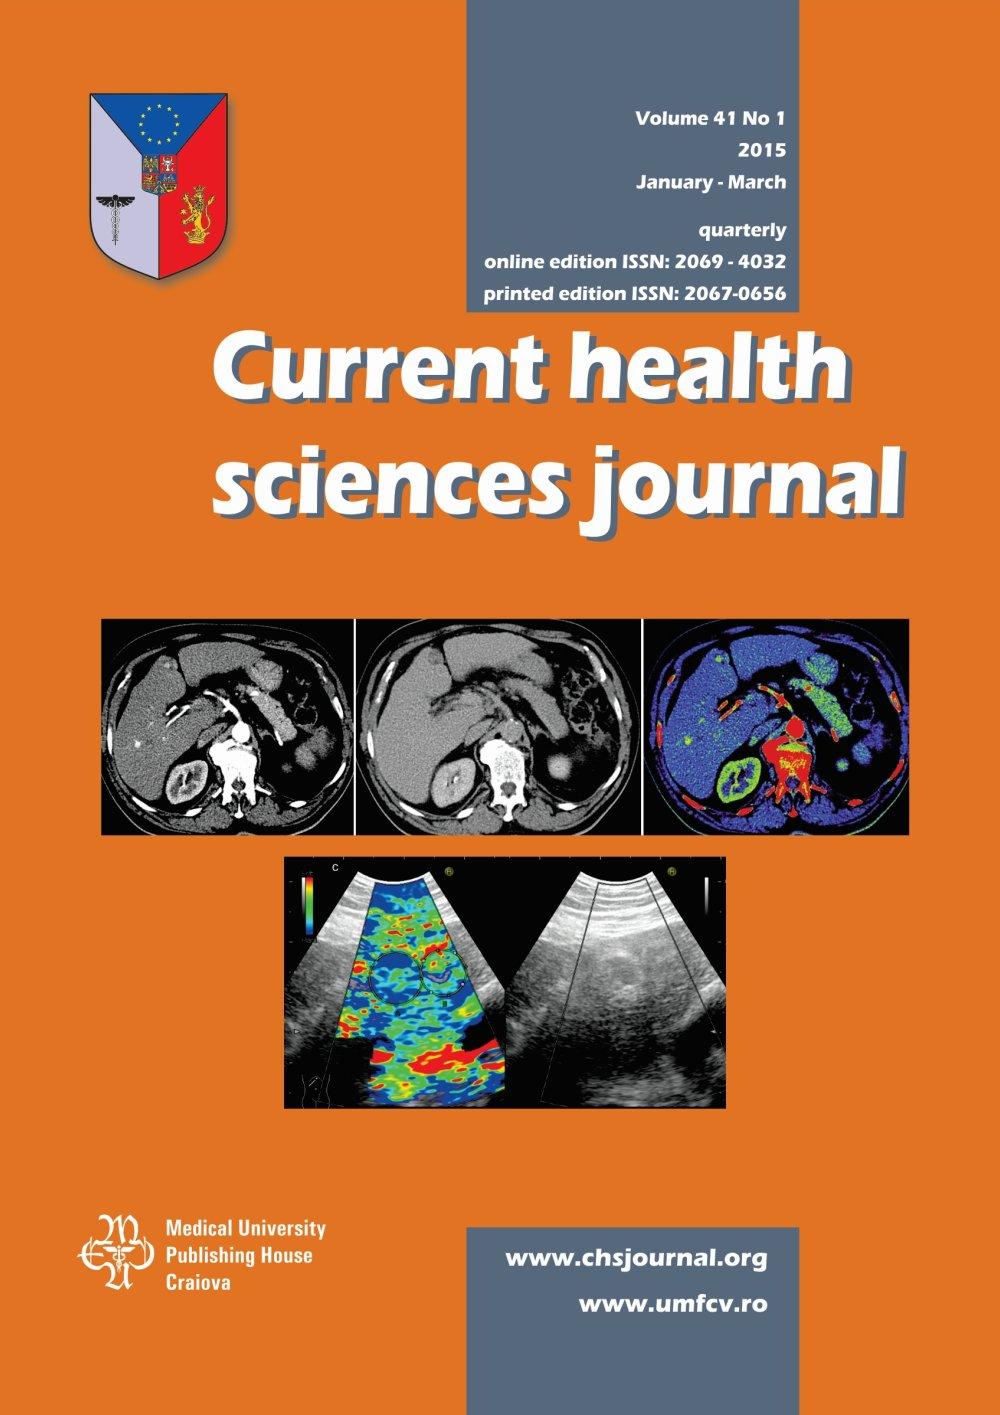 Current Health Sciences Journal, vol. 41 no. 1, 2015